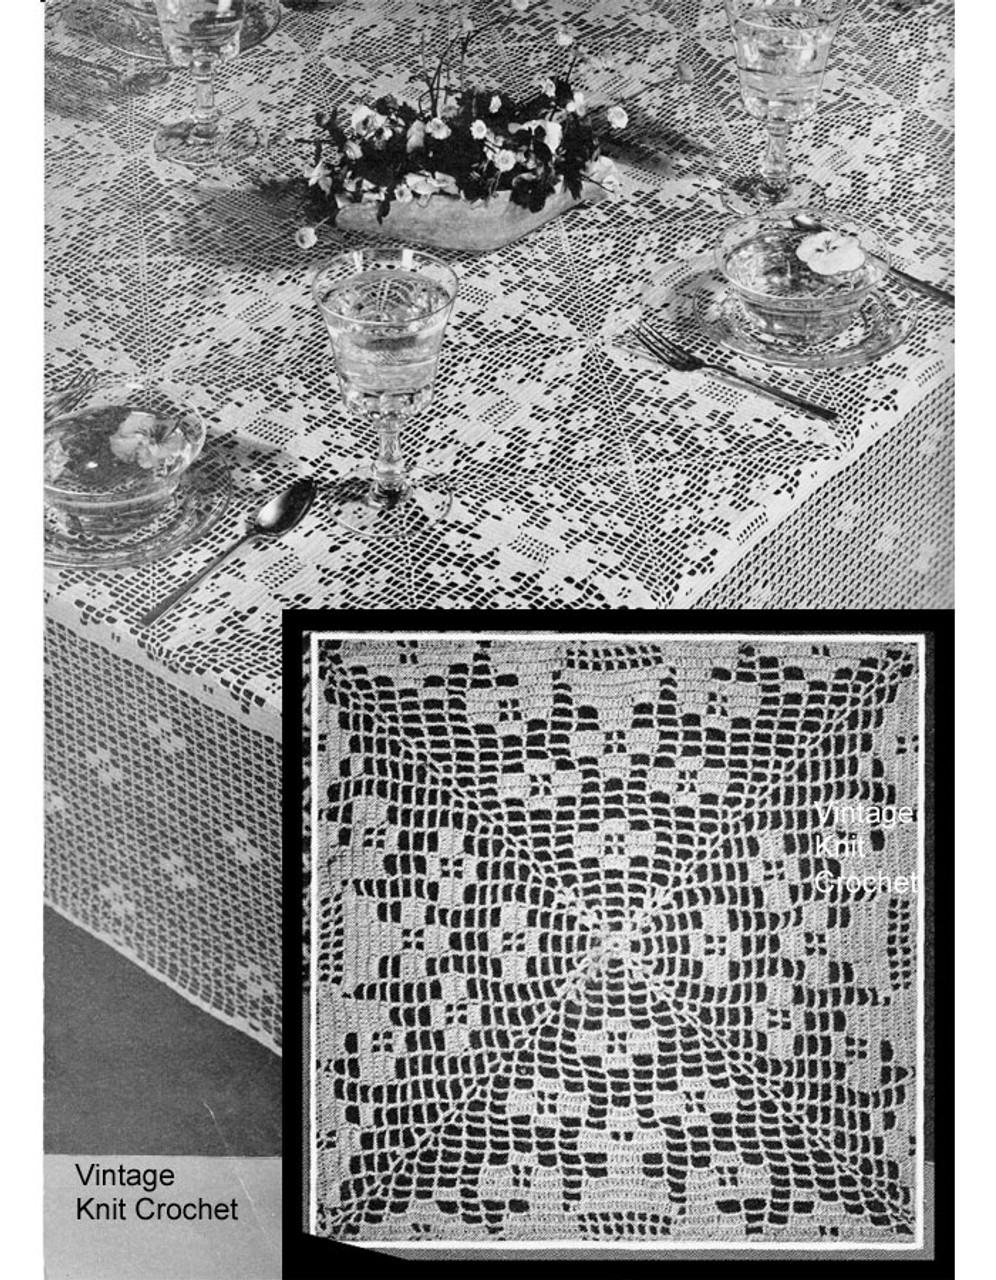 Vintage Filet Crochet Tablecloth Pattern